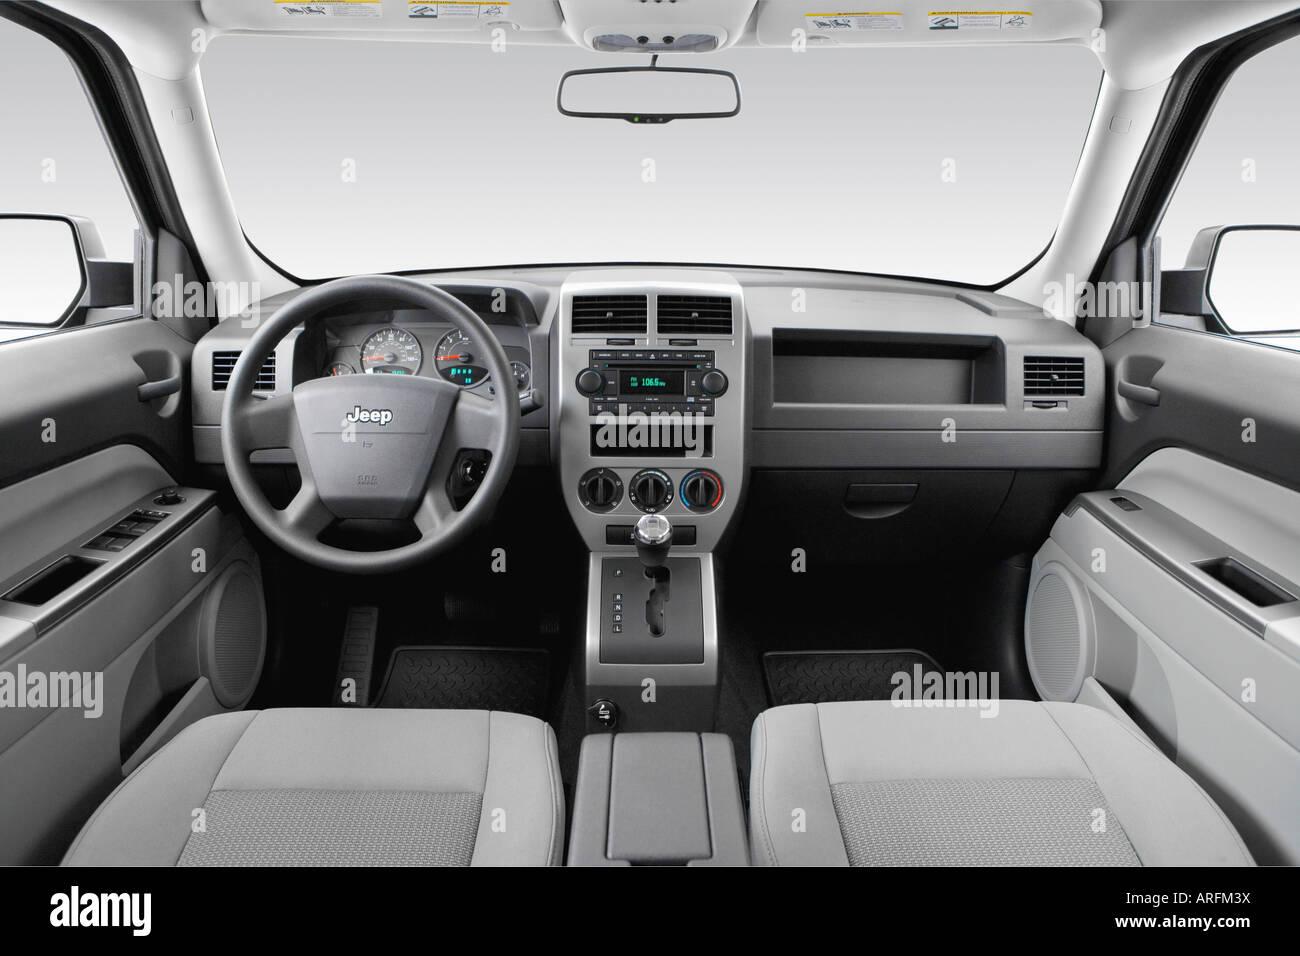 2007 jeep patriot sport in green - dashboard, center console, gear